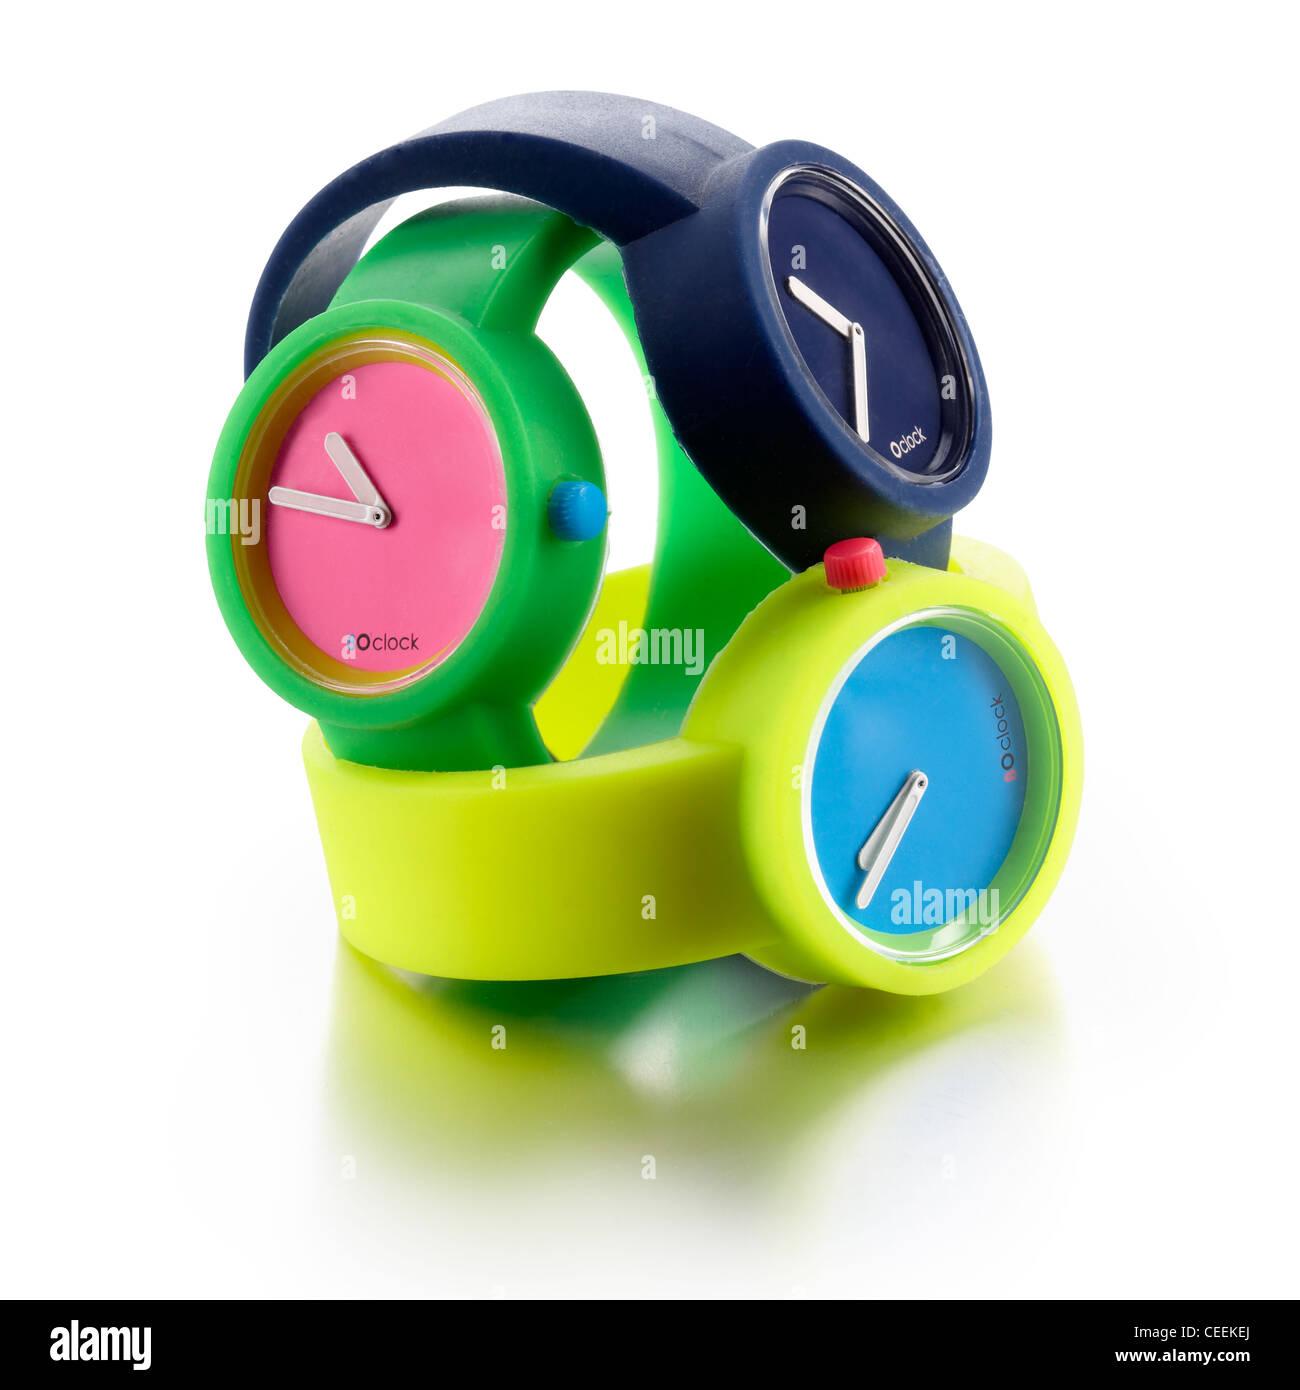 3 plastic bright watches - Stock Image